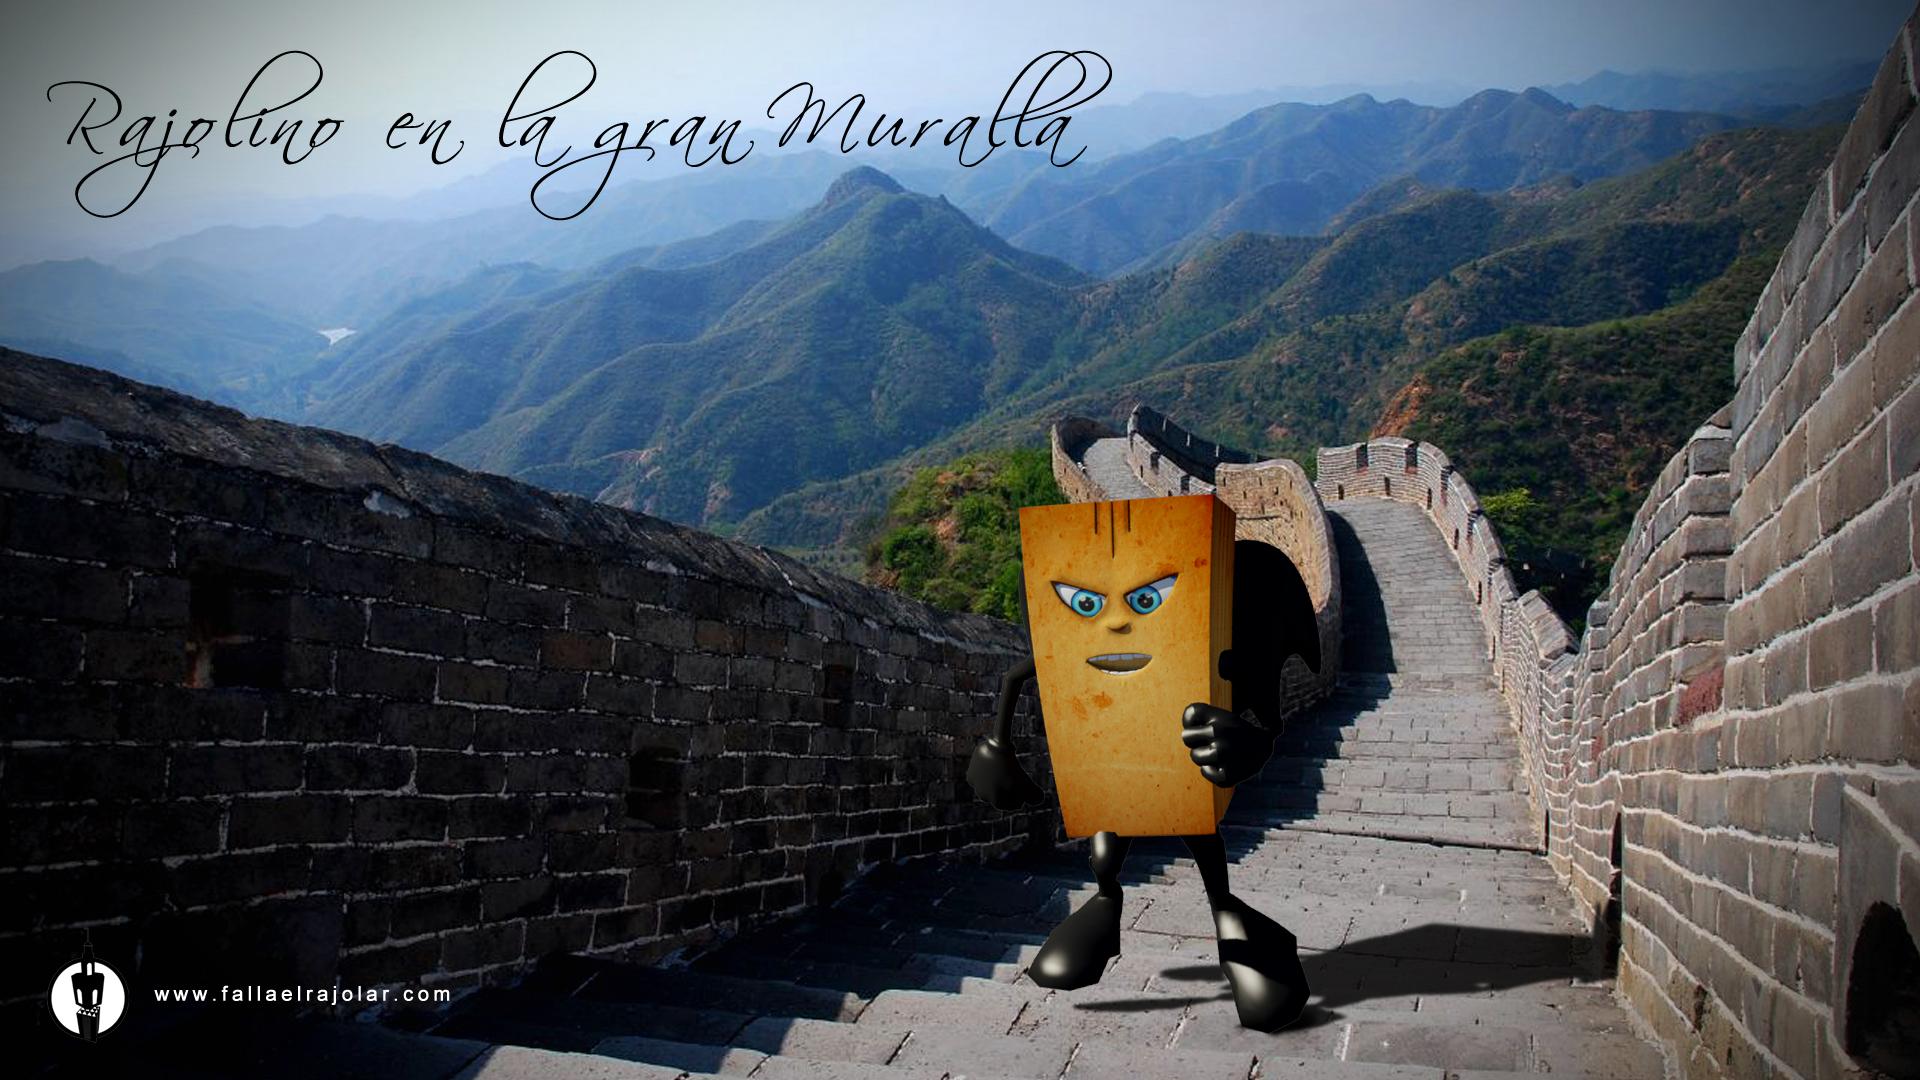 Rajolino on the Great Wall of China